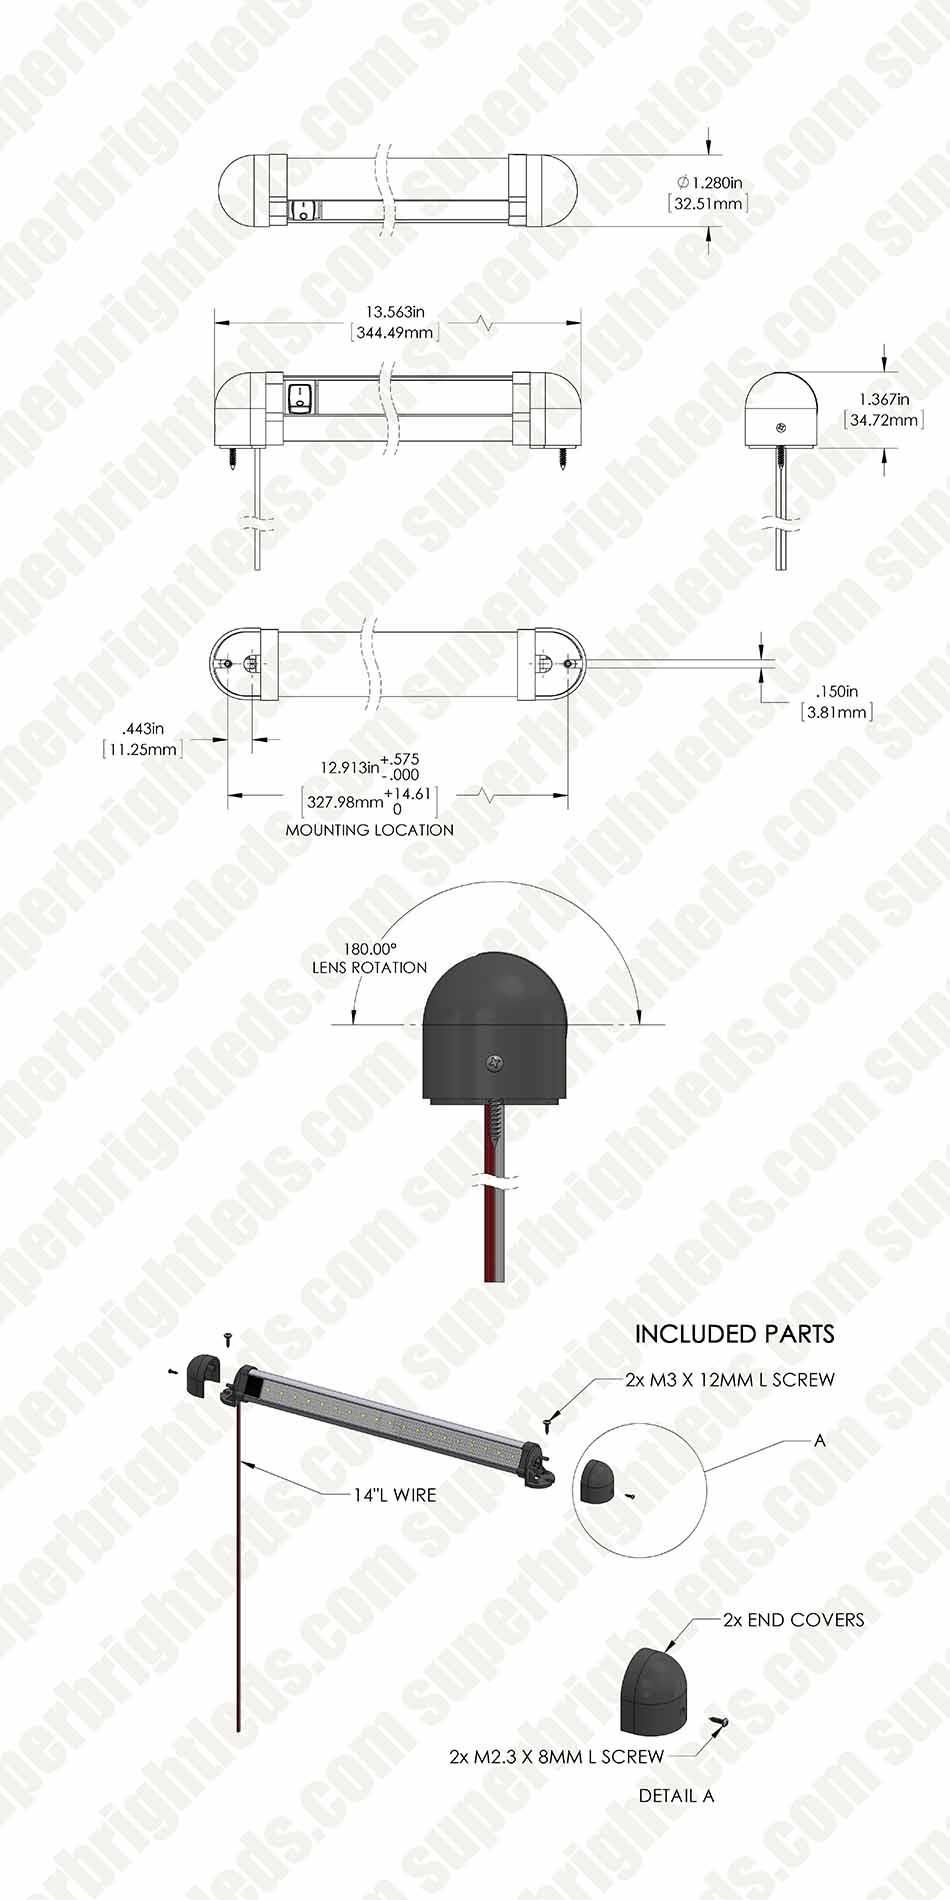 135 Swivel Utility Led Light Bar With Rocker Switch 150 Lumens Wiring Diagram Mini